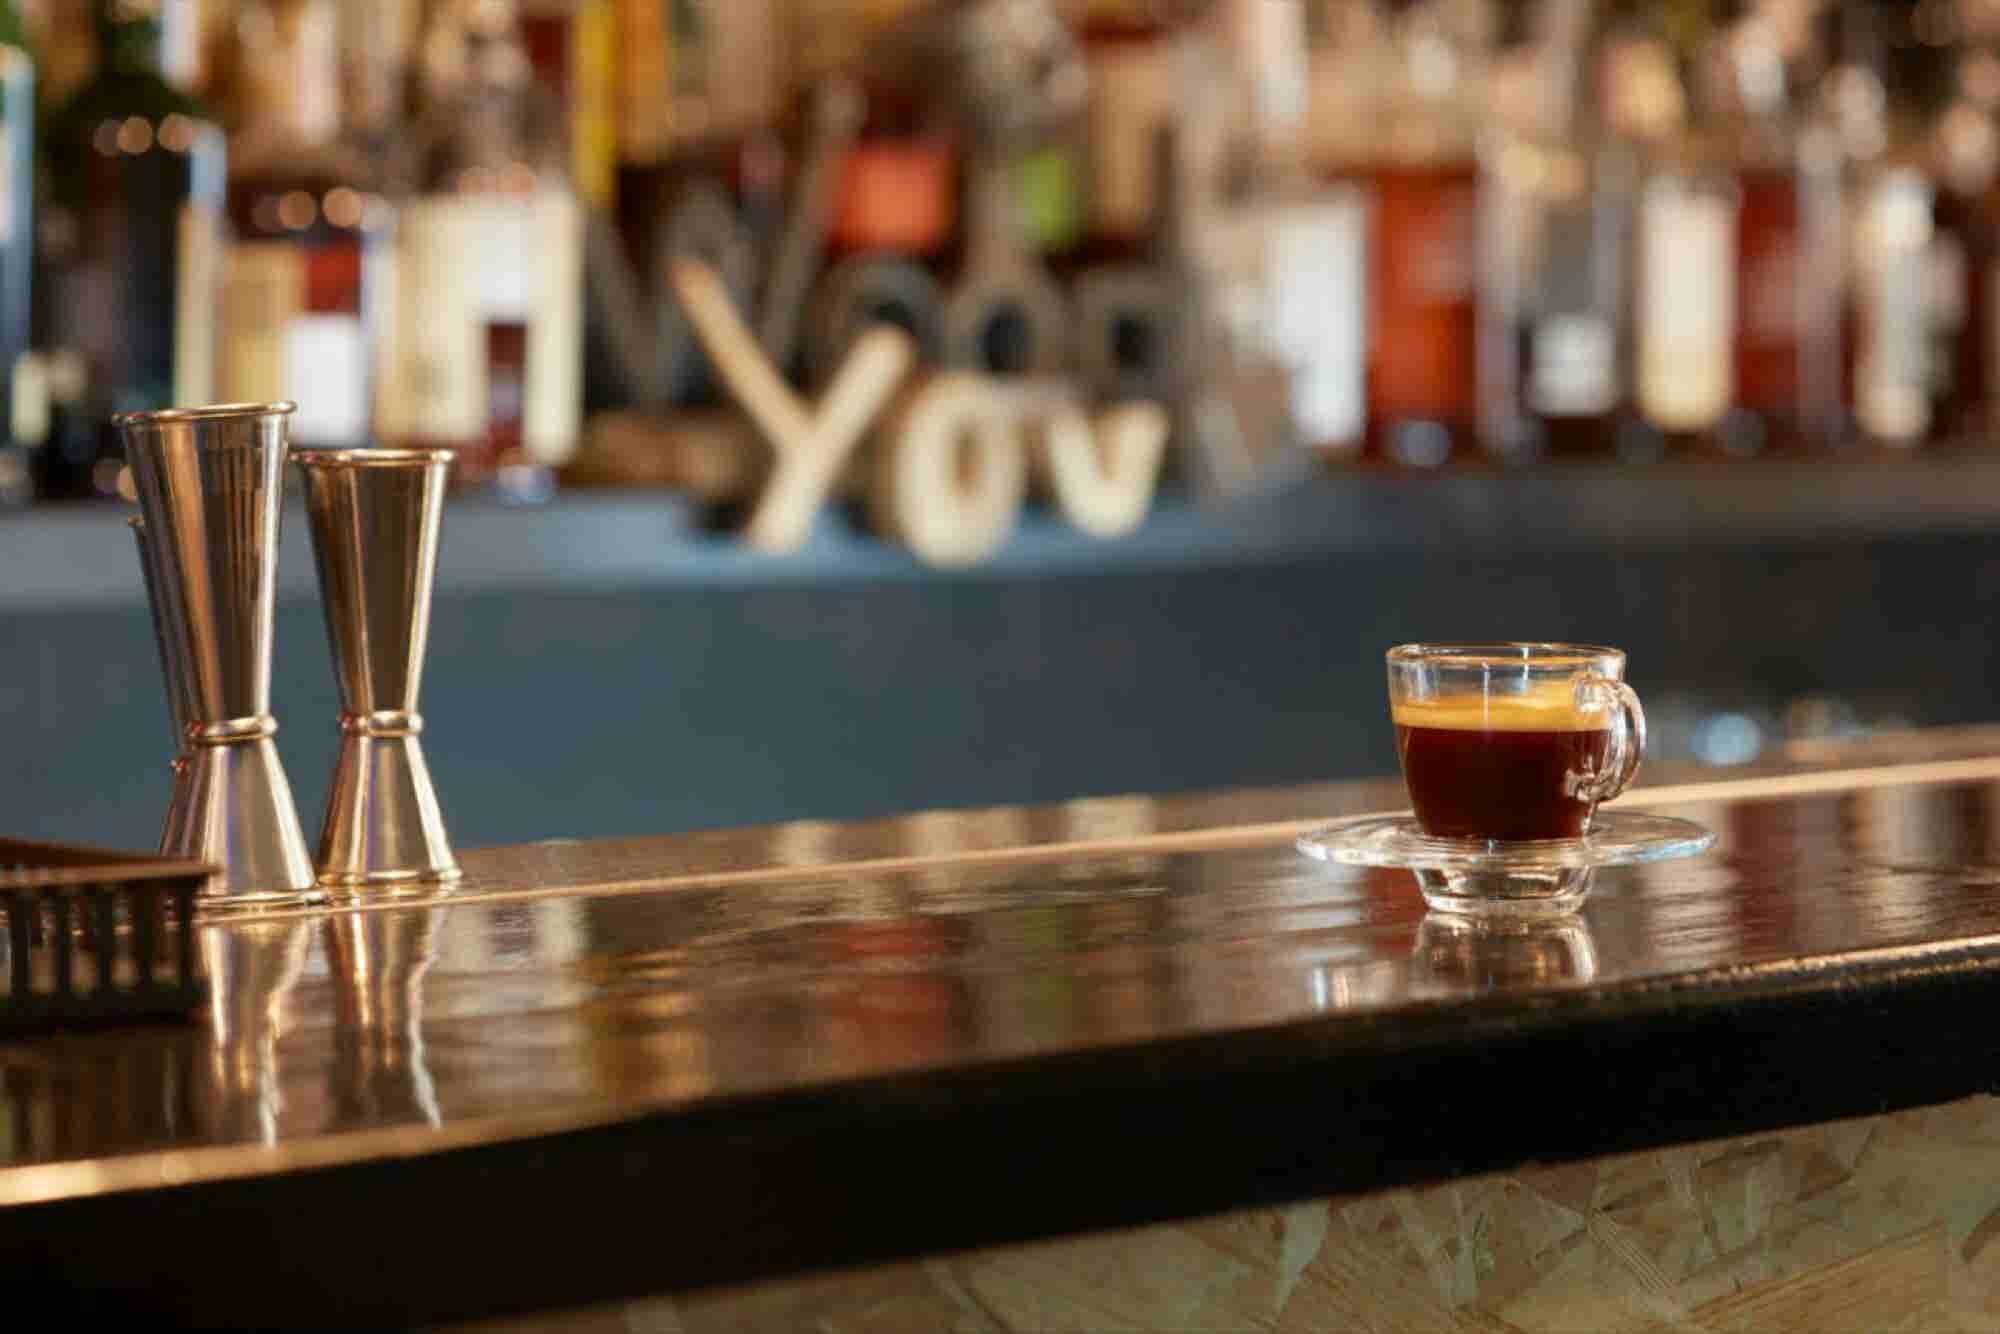 ¡Una idea de negocios diferente! Abre un bar de café